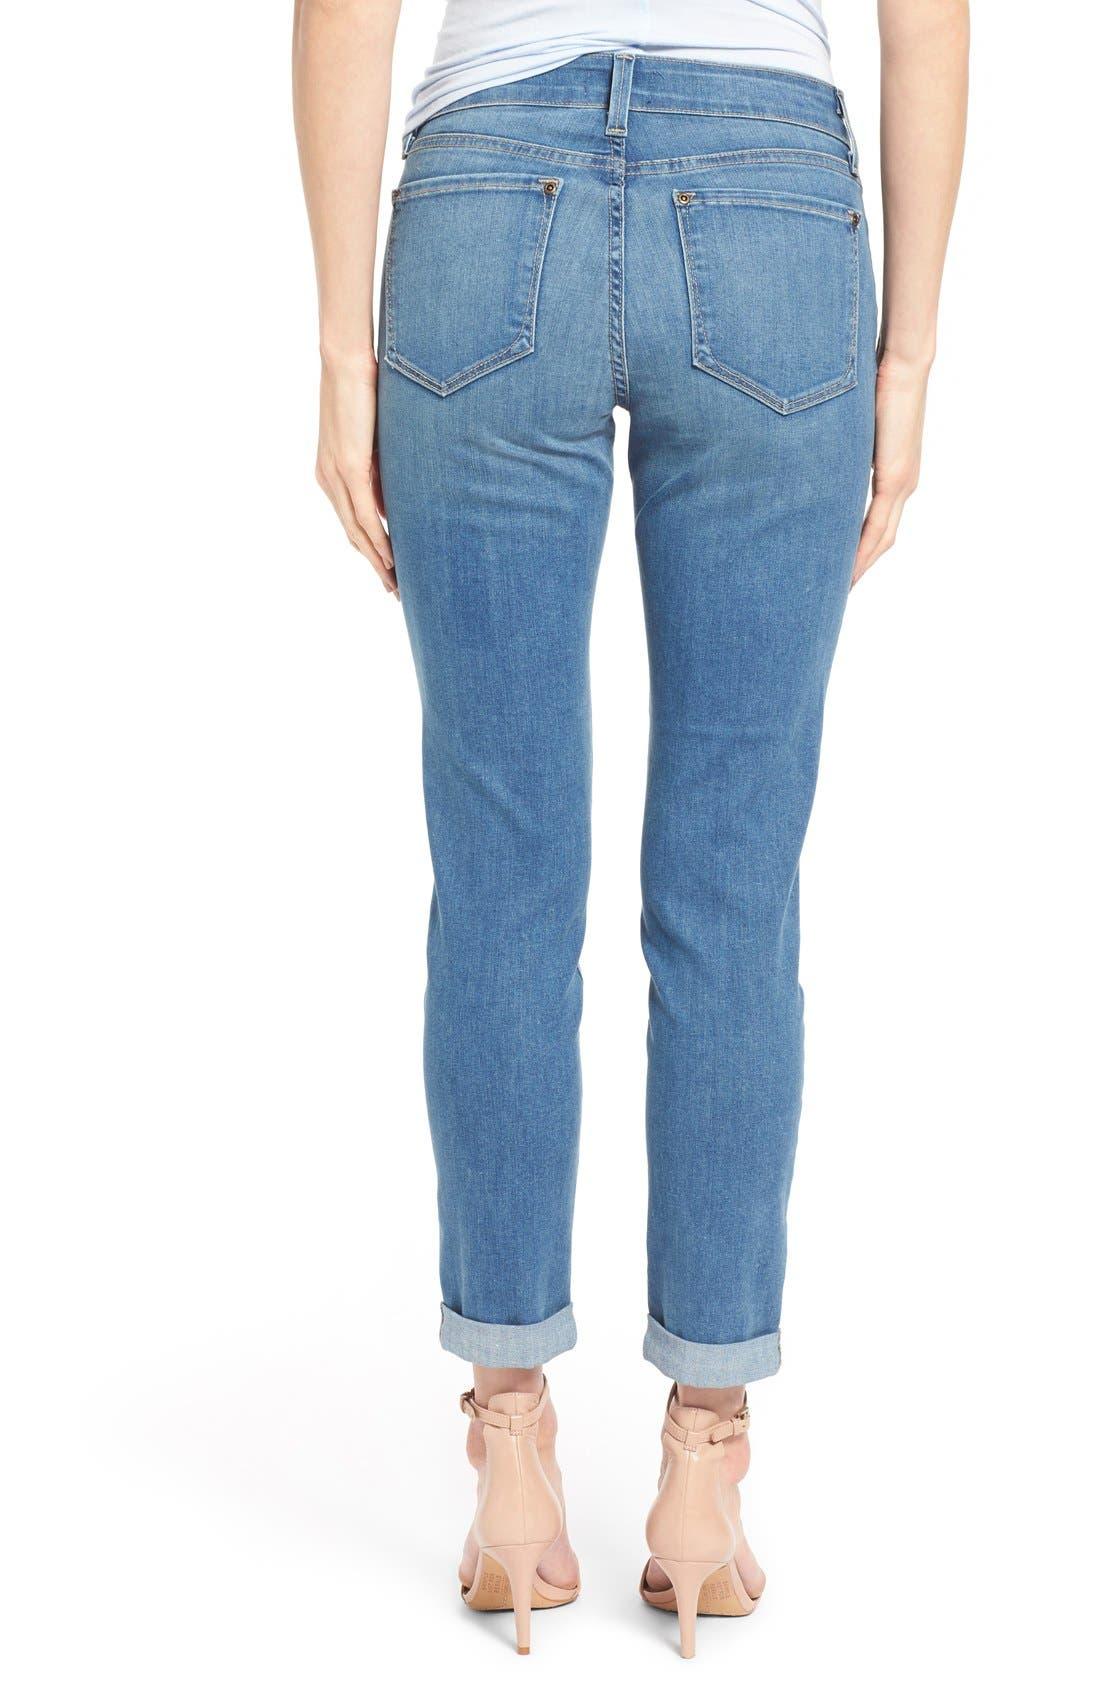 Alternate Image 2  - NYDJ 'Anabelle' Stretch Skinny Boyfriend Jeans (Upper Falls) (Regular & Petite)